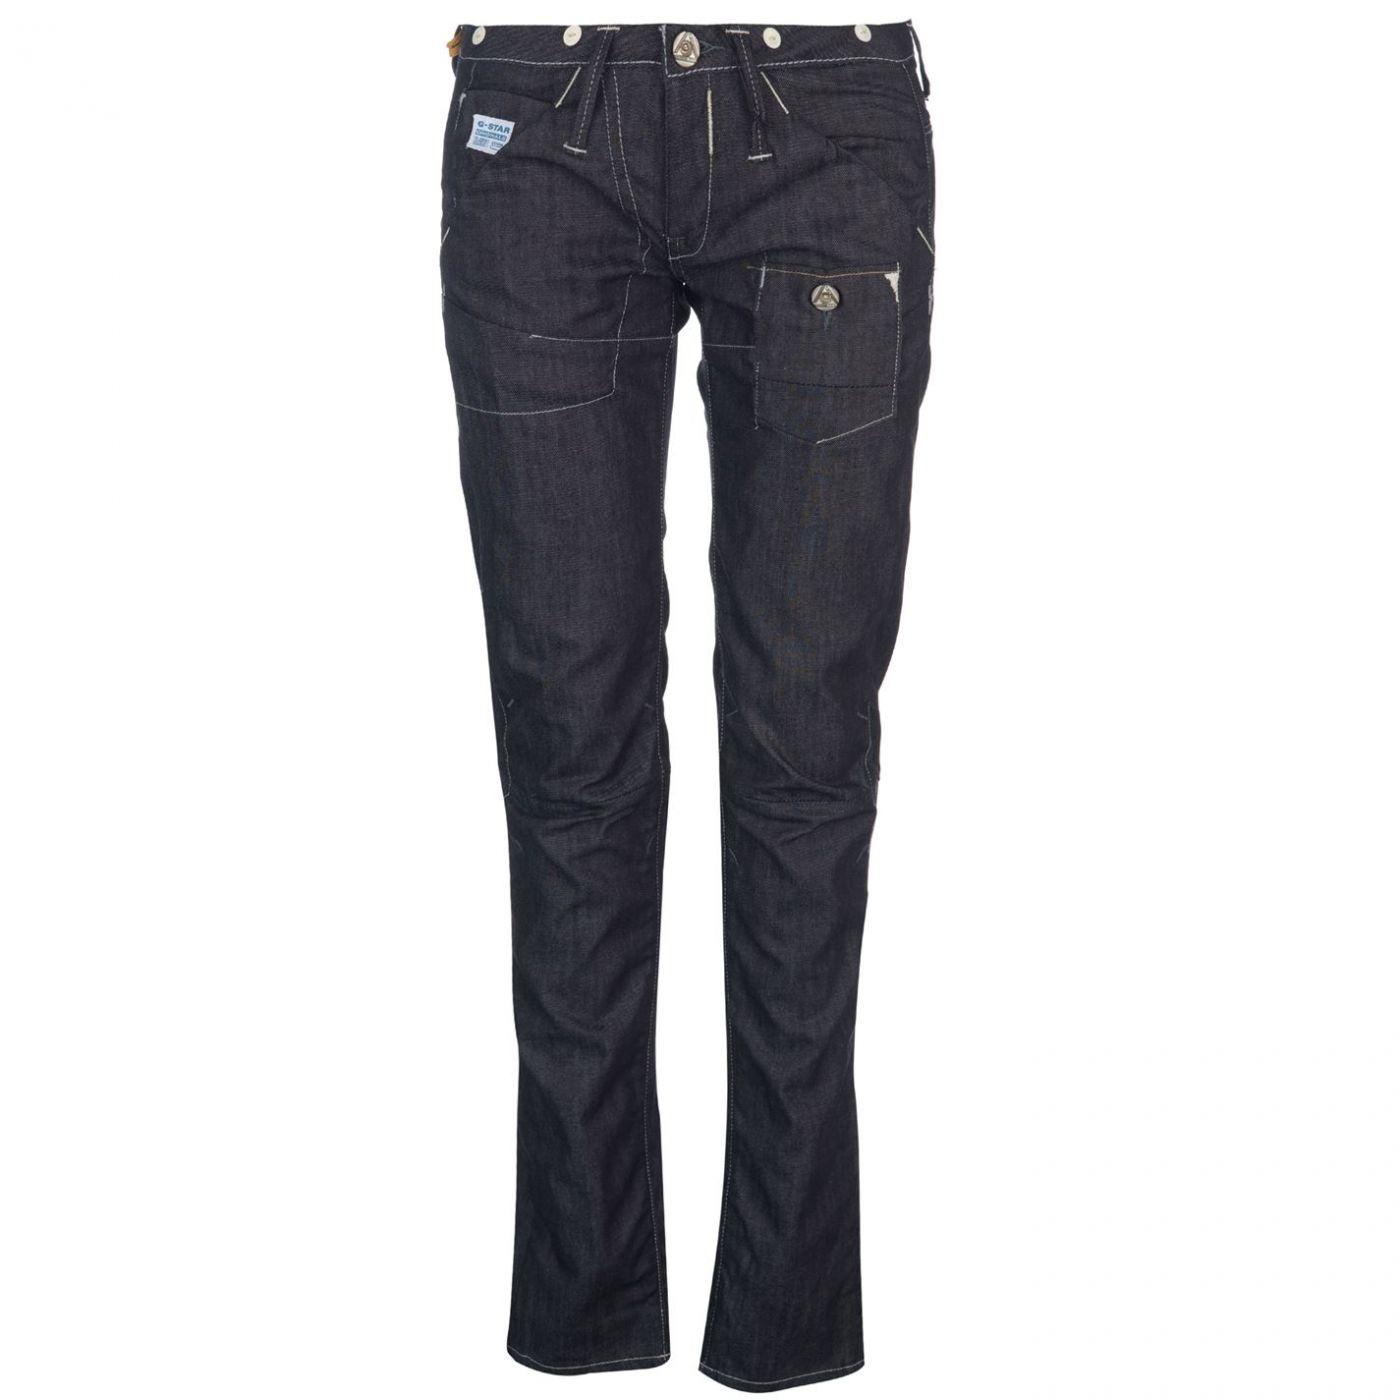 G Star 60352 Jeans